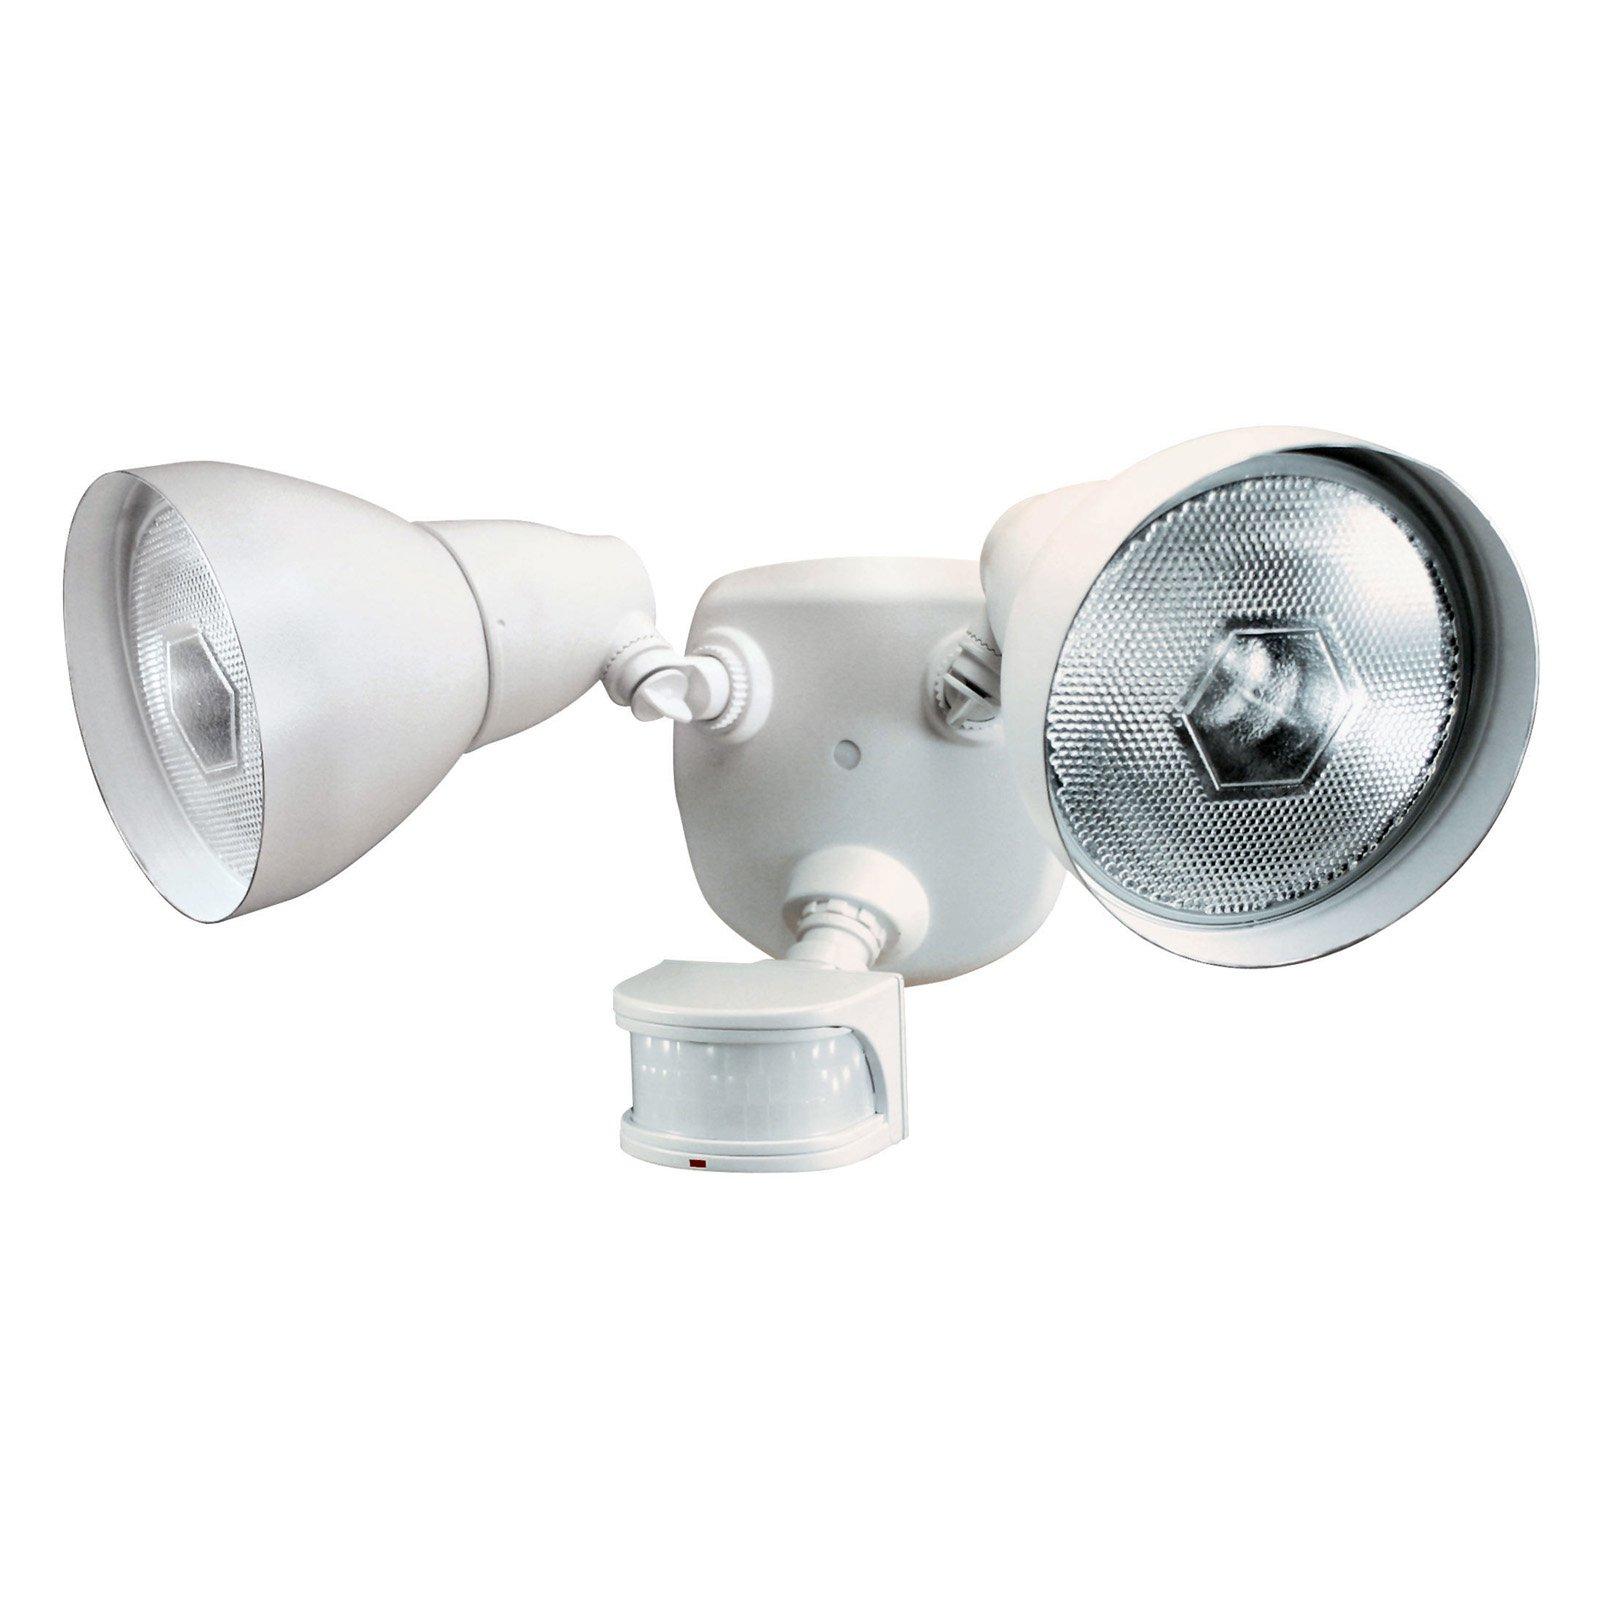 Heathco hz 5718 270 degree dualbrite motion sensor light control heathco hz 5718 270 degree dualbrite motion sensor light control walmart aloadofball Images